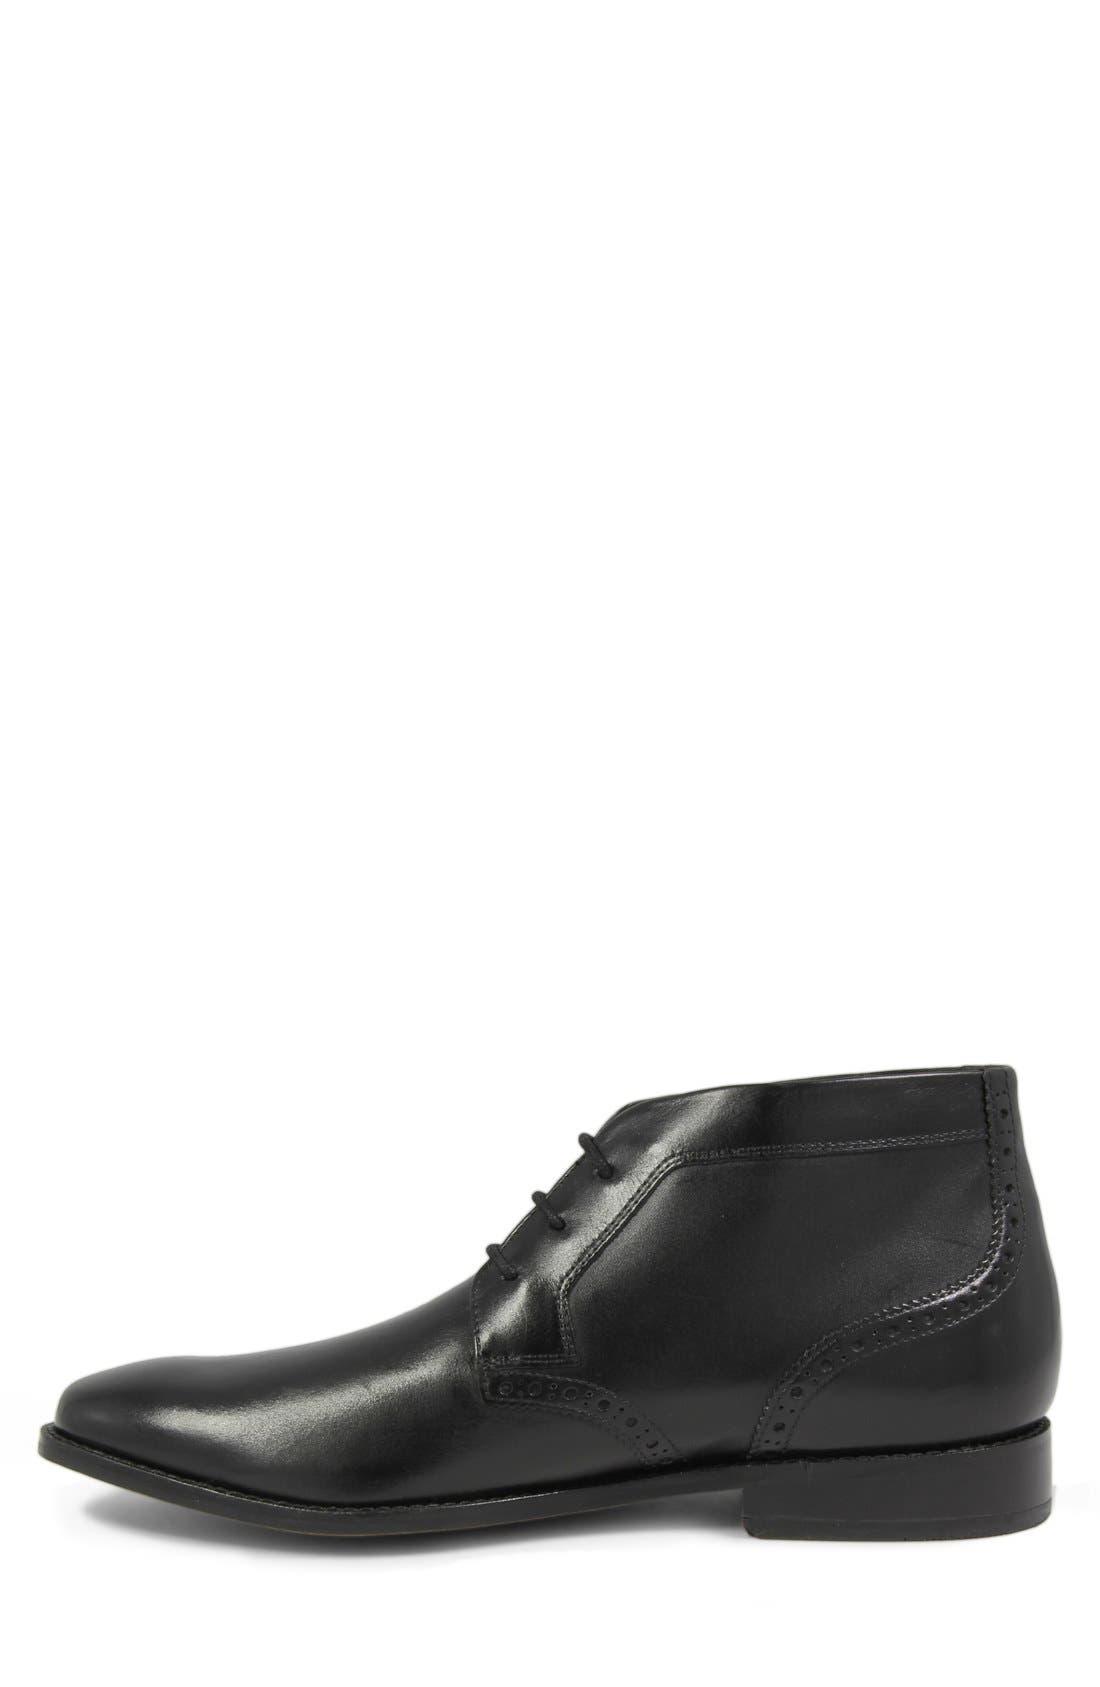 'Castellano' Chukka Boot,                             Alternate thumbnail 2, color,                             001